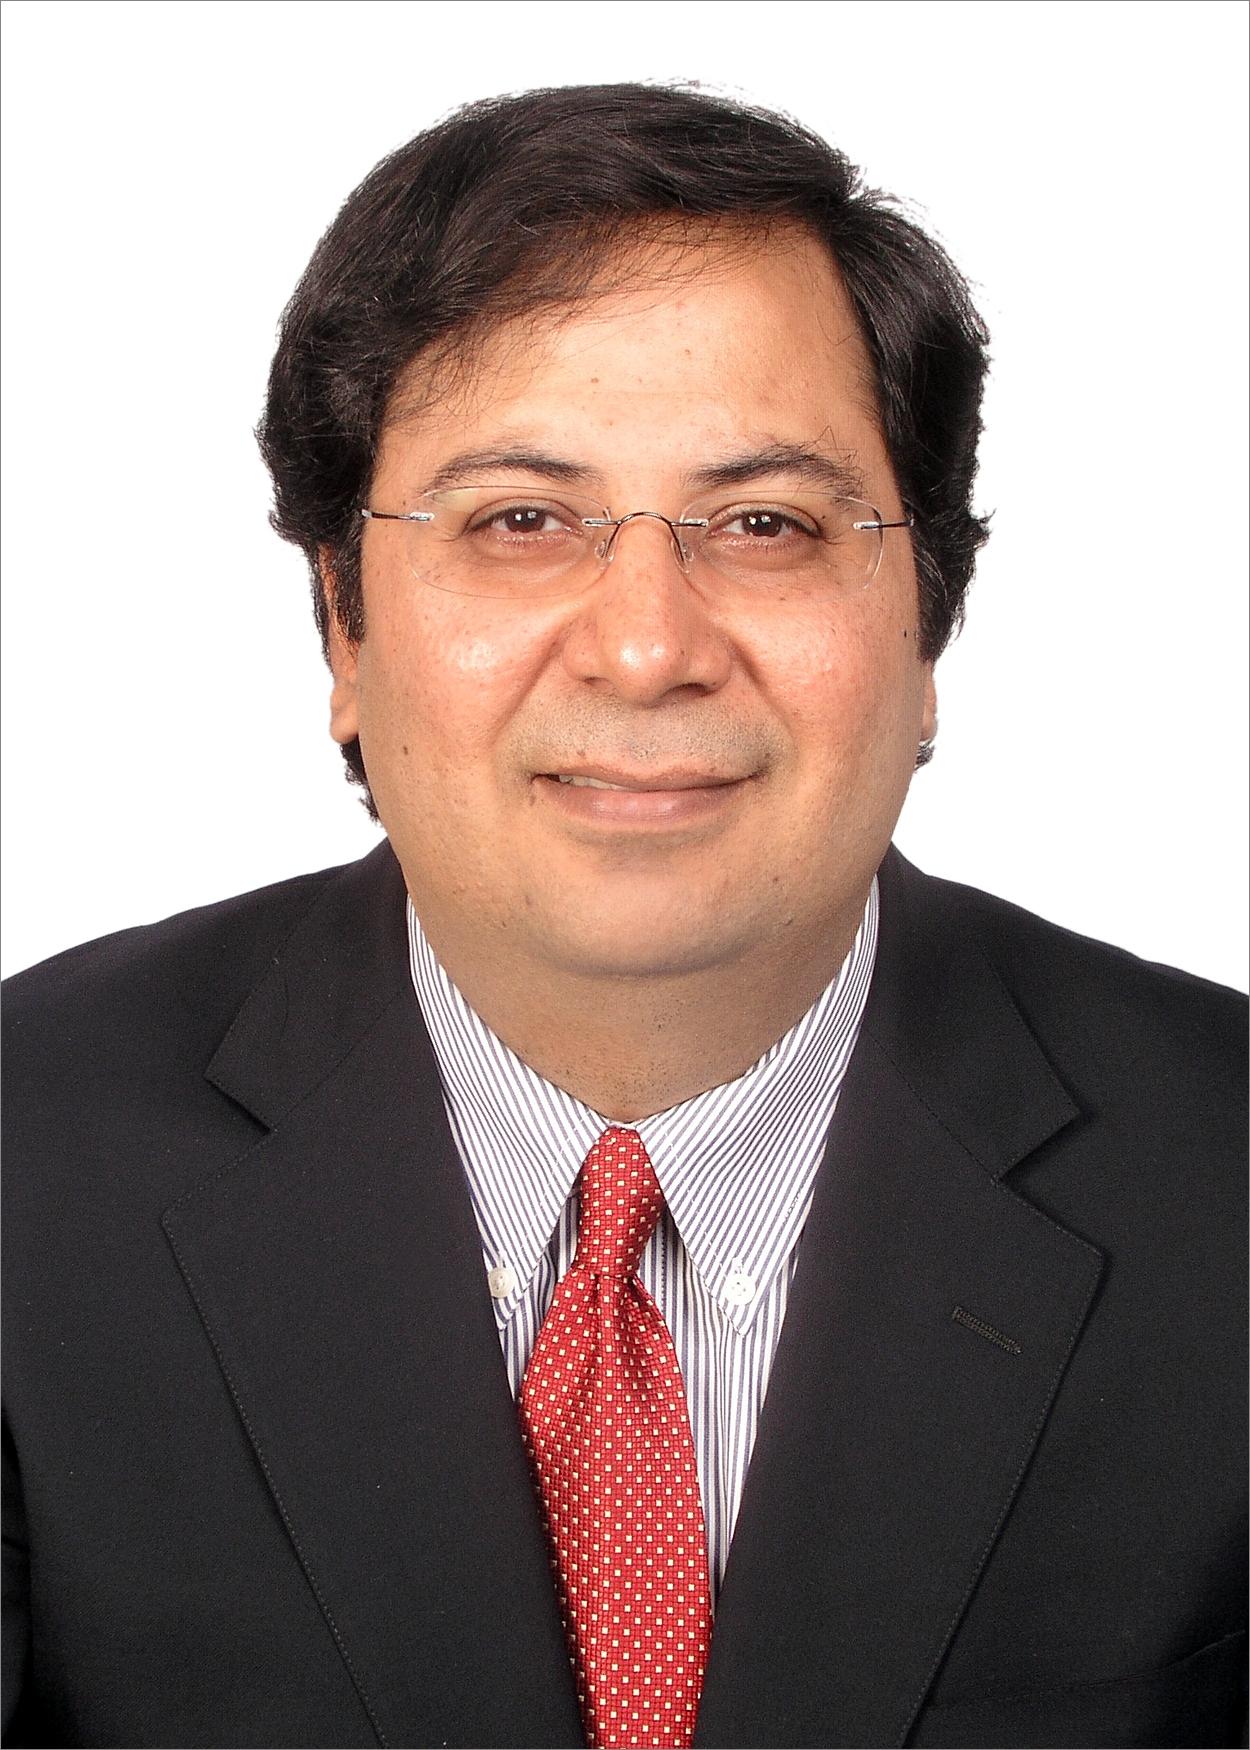 Suresh Photo Aug 29th 2006.jpeg